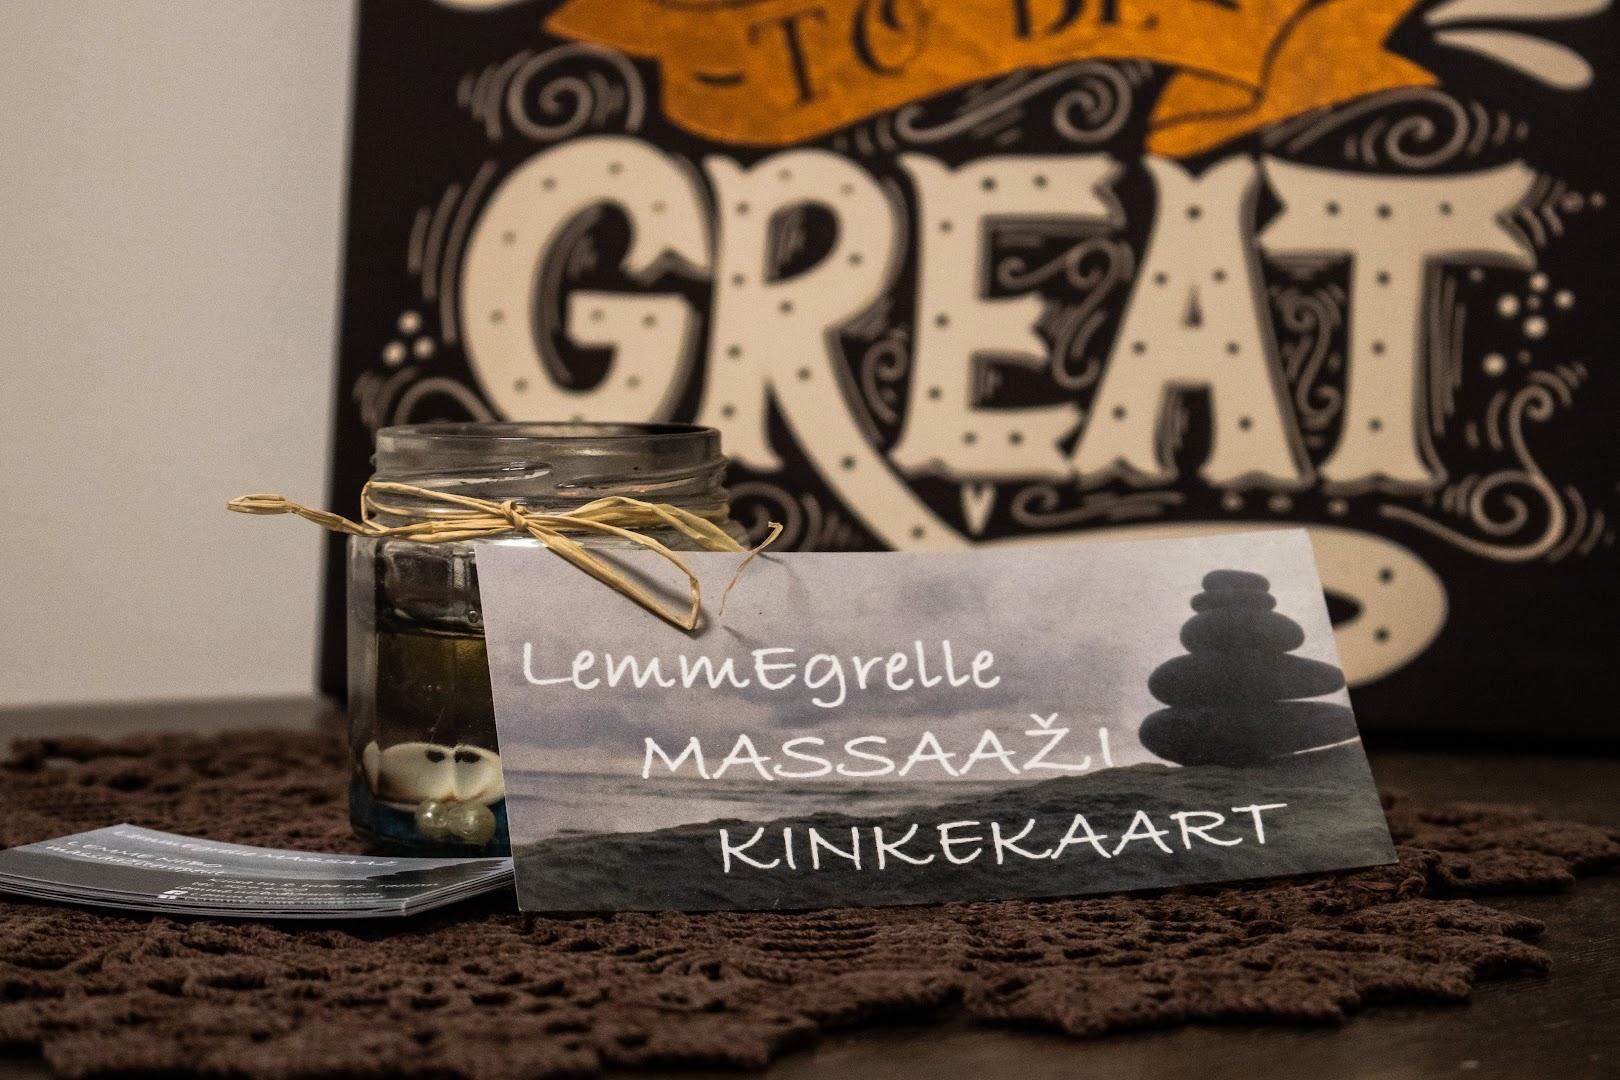 Egrelle Kinkekaart